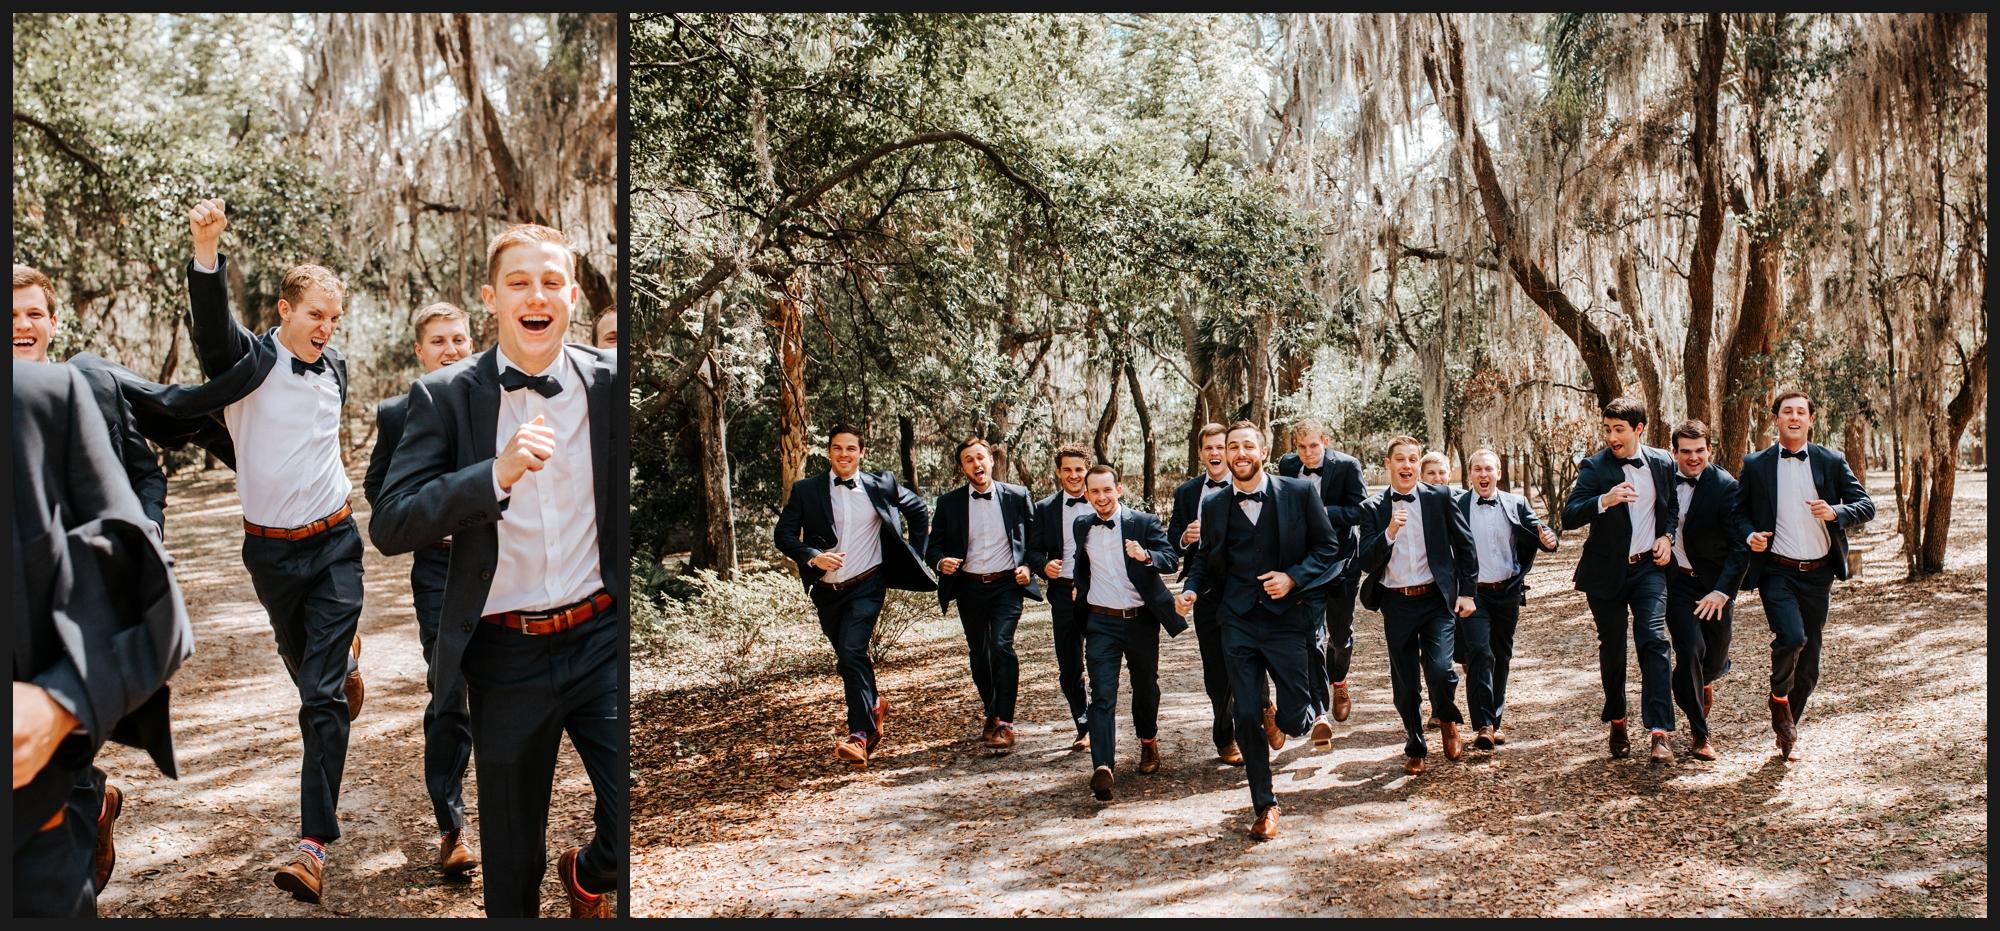 Orlando-Wedding-Photographer_0014.jpg